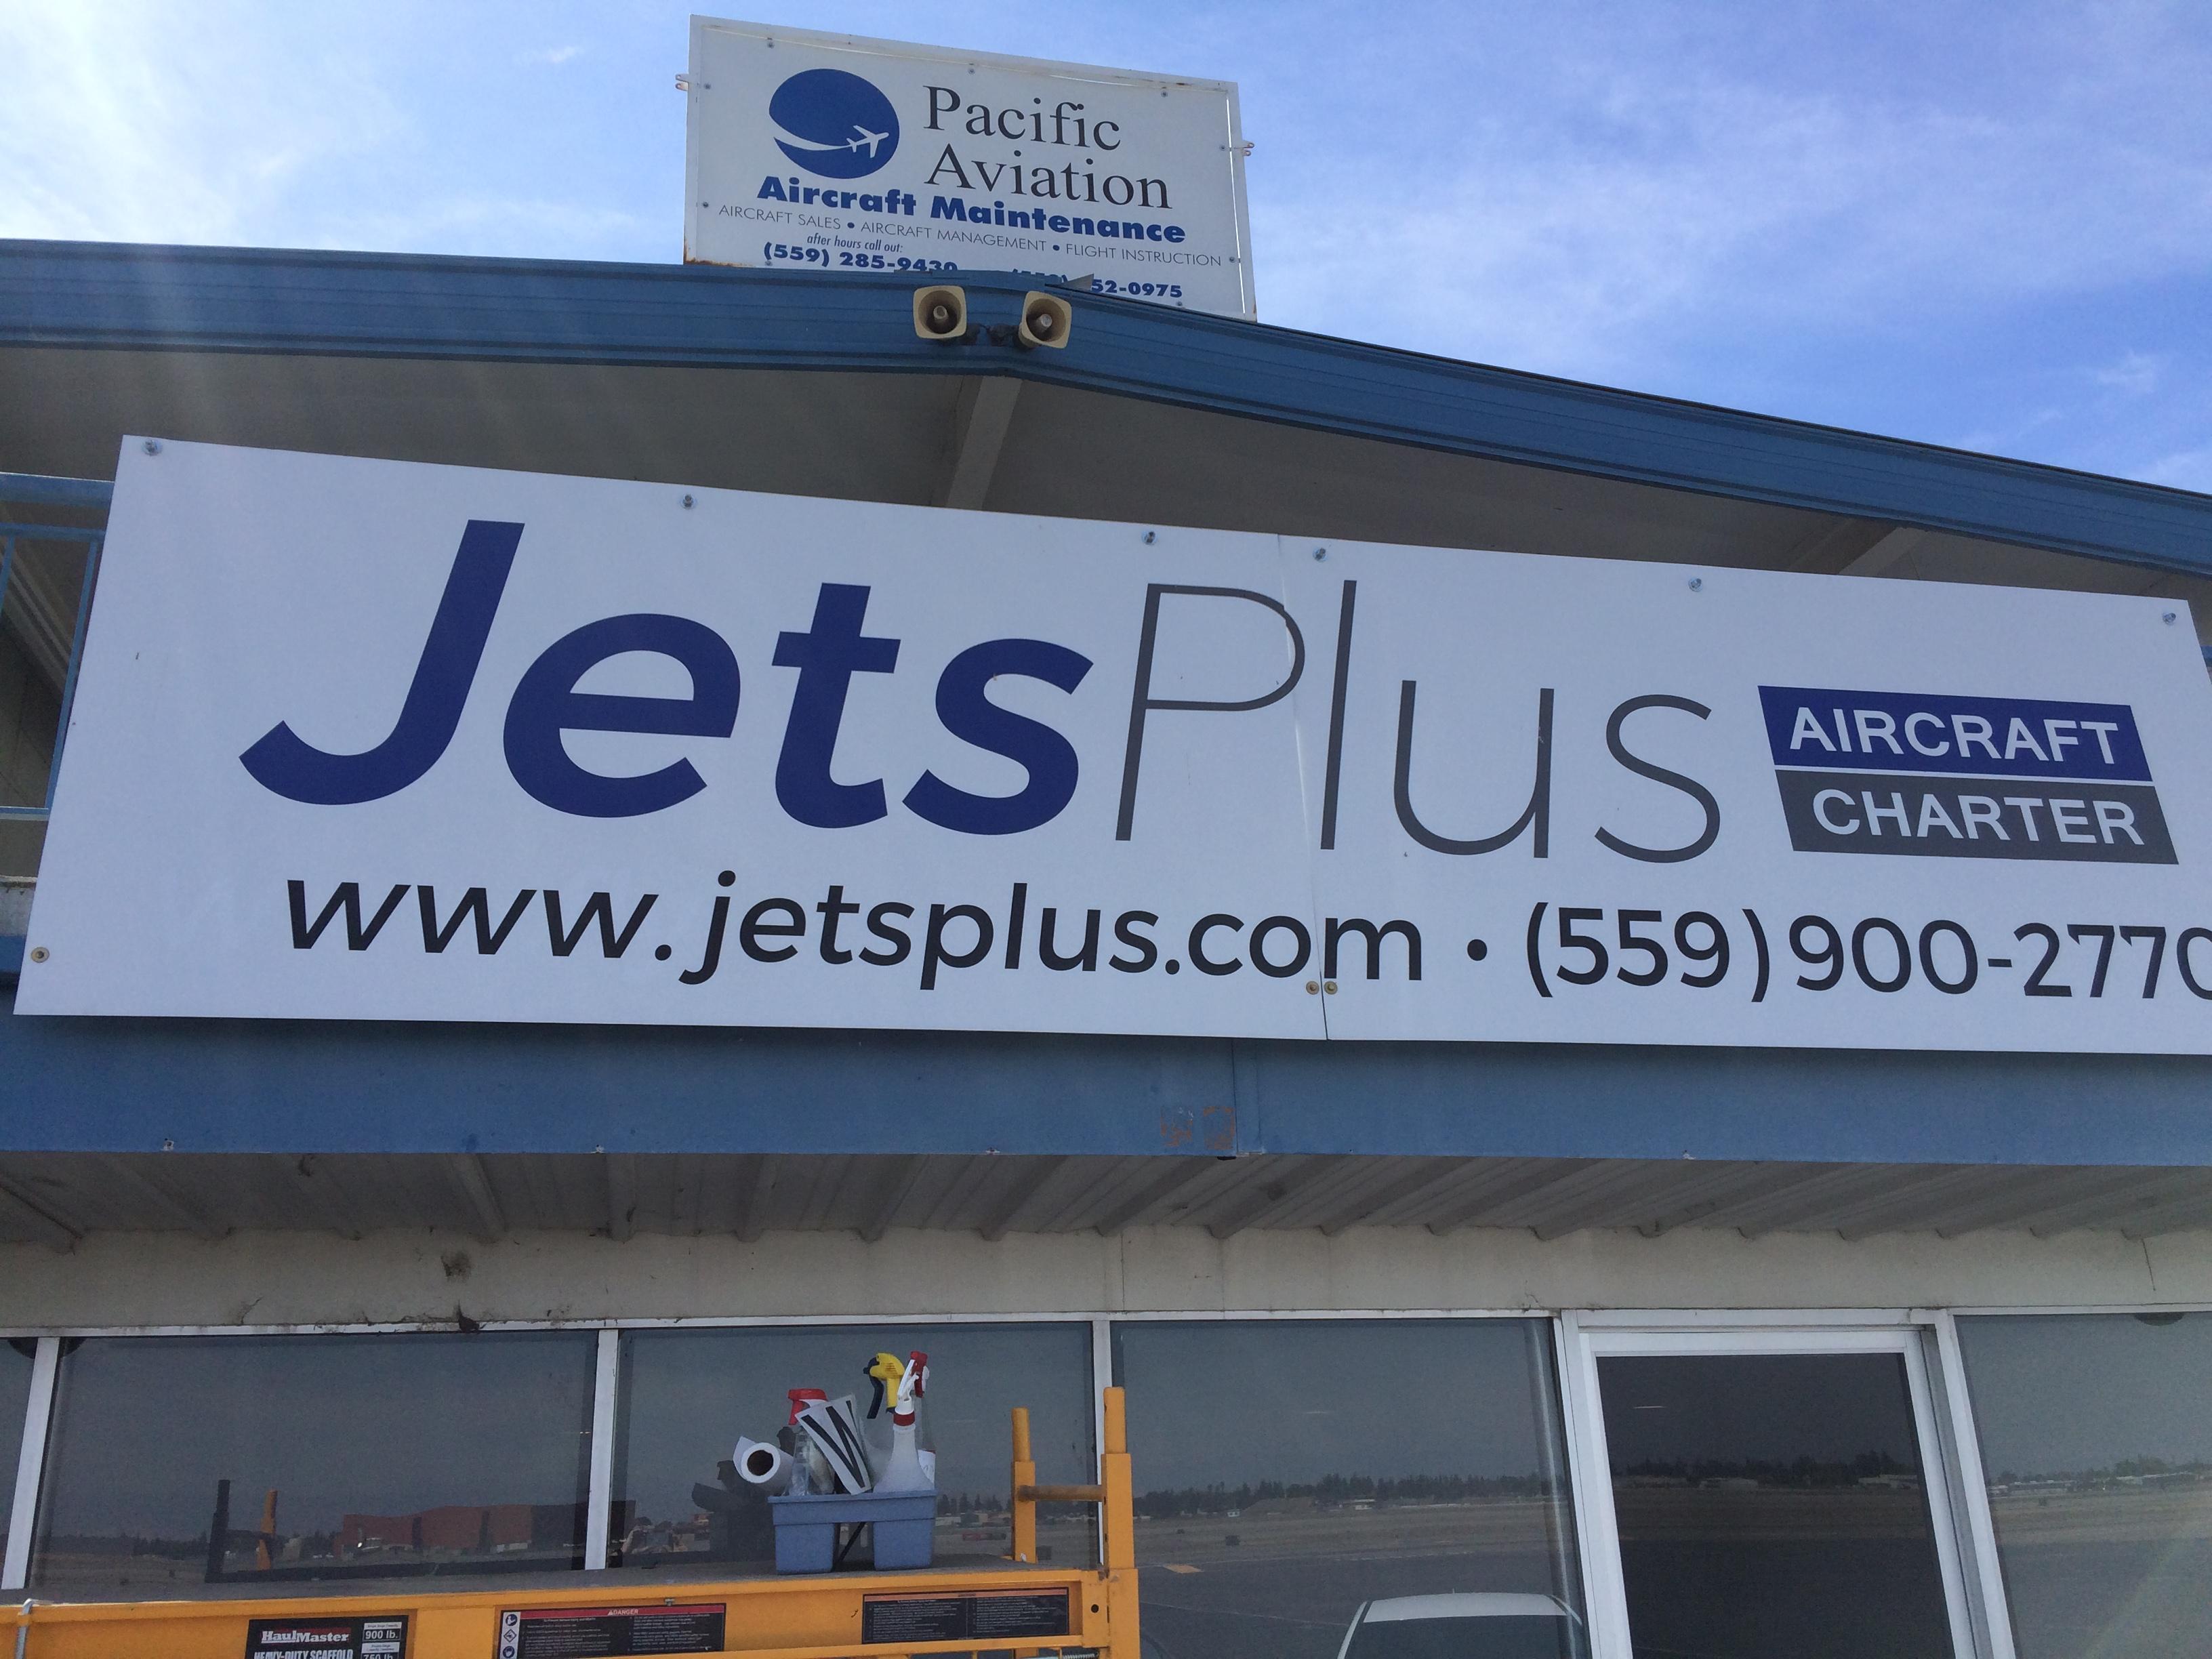 Jets Plus